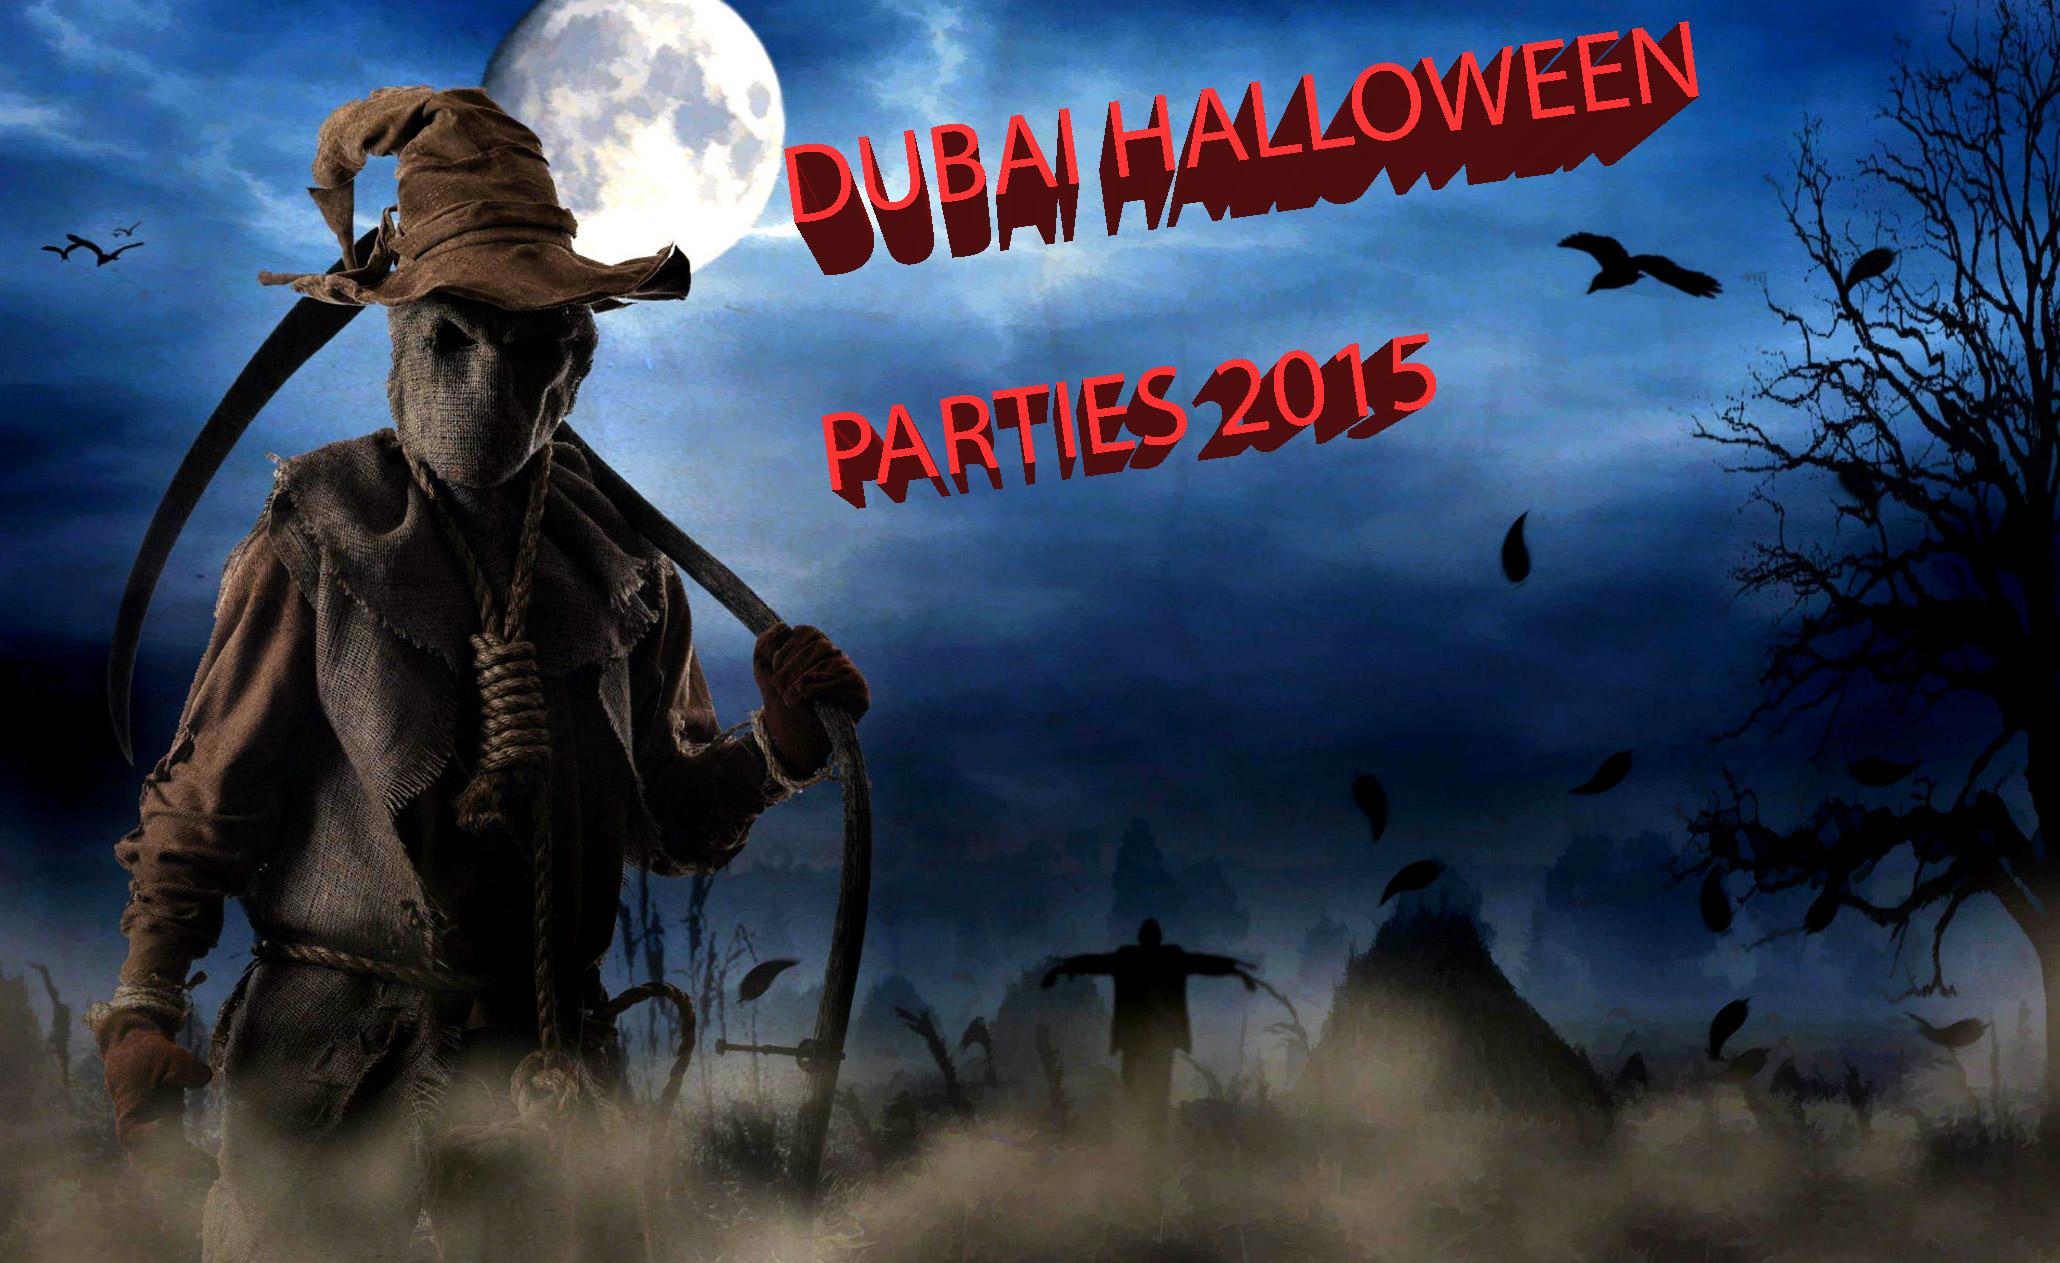 List of halloween parties in dubai for 2015